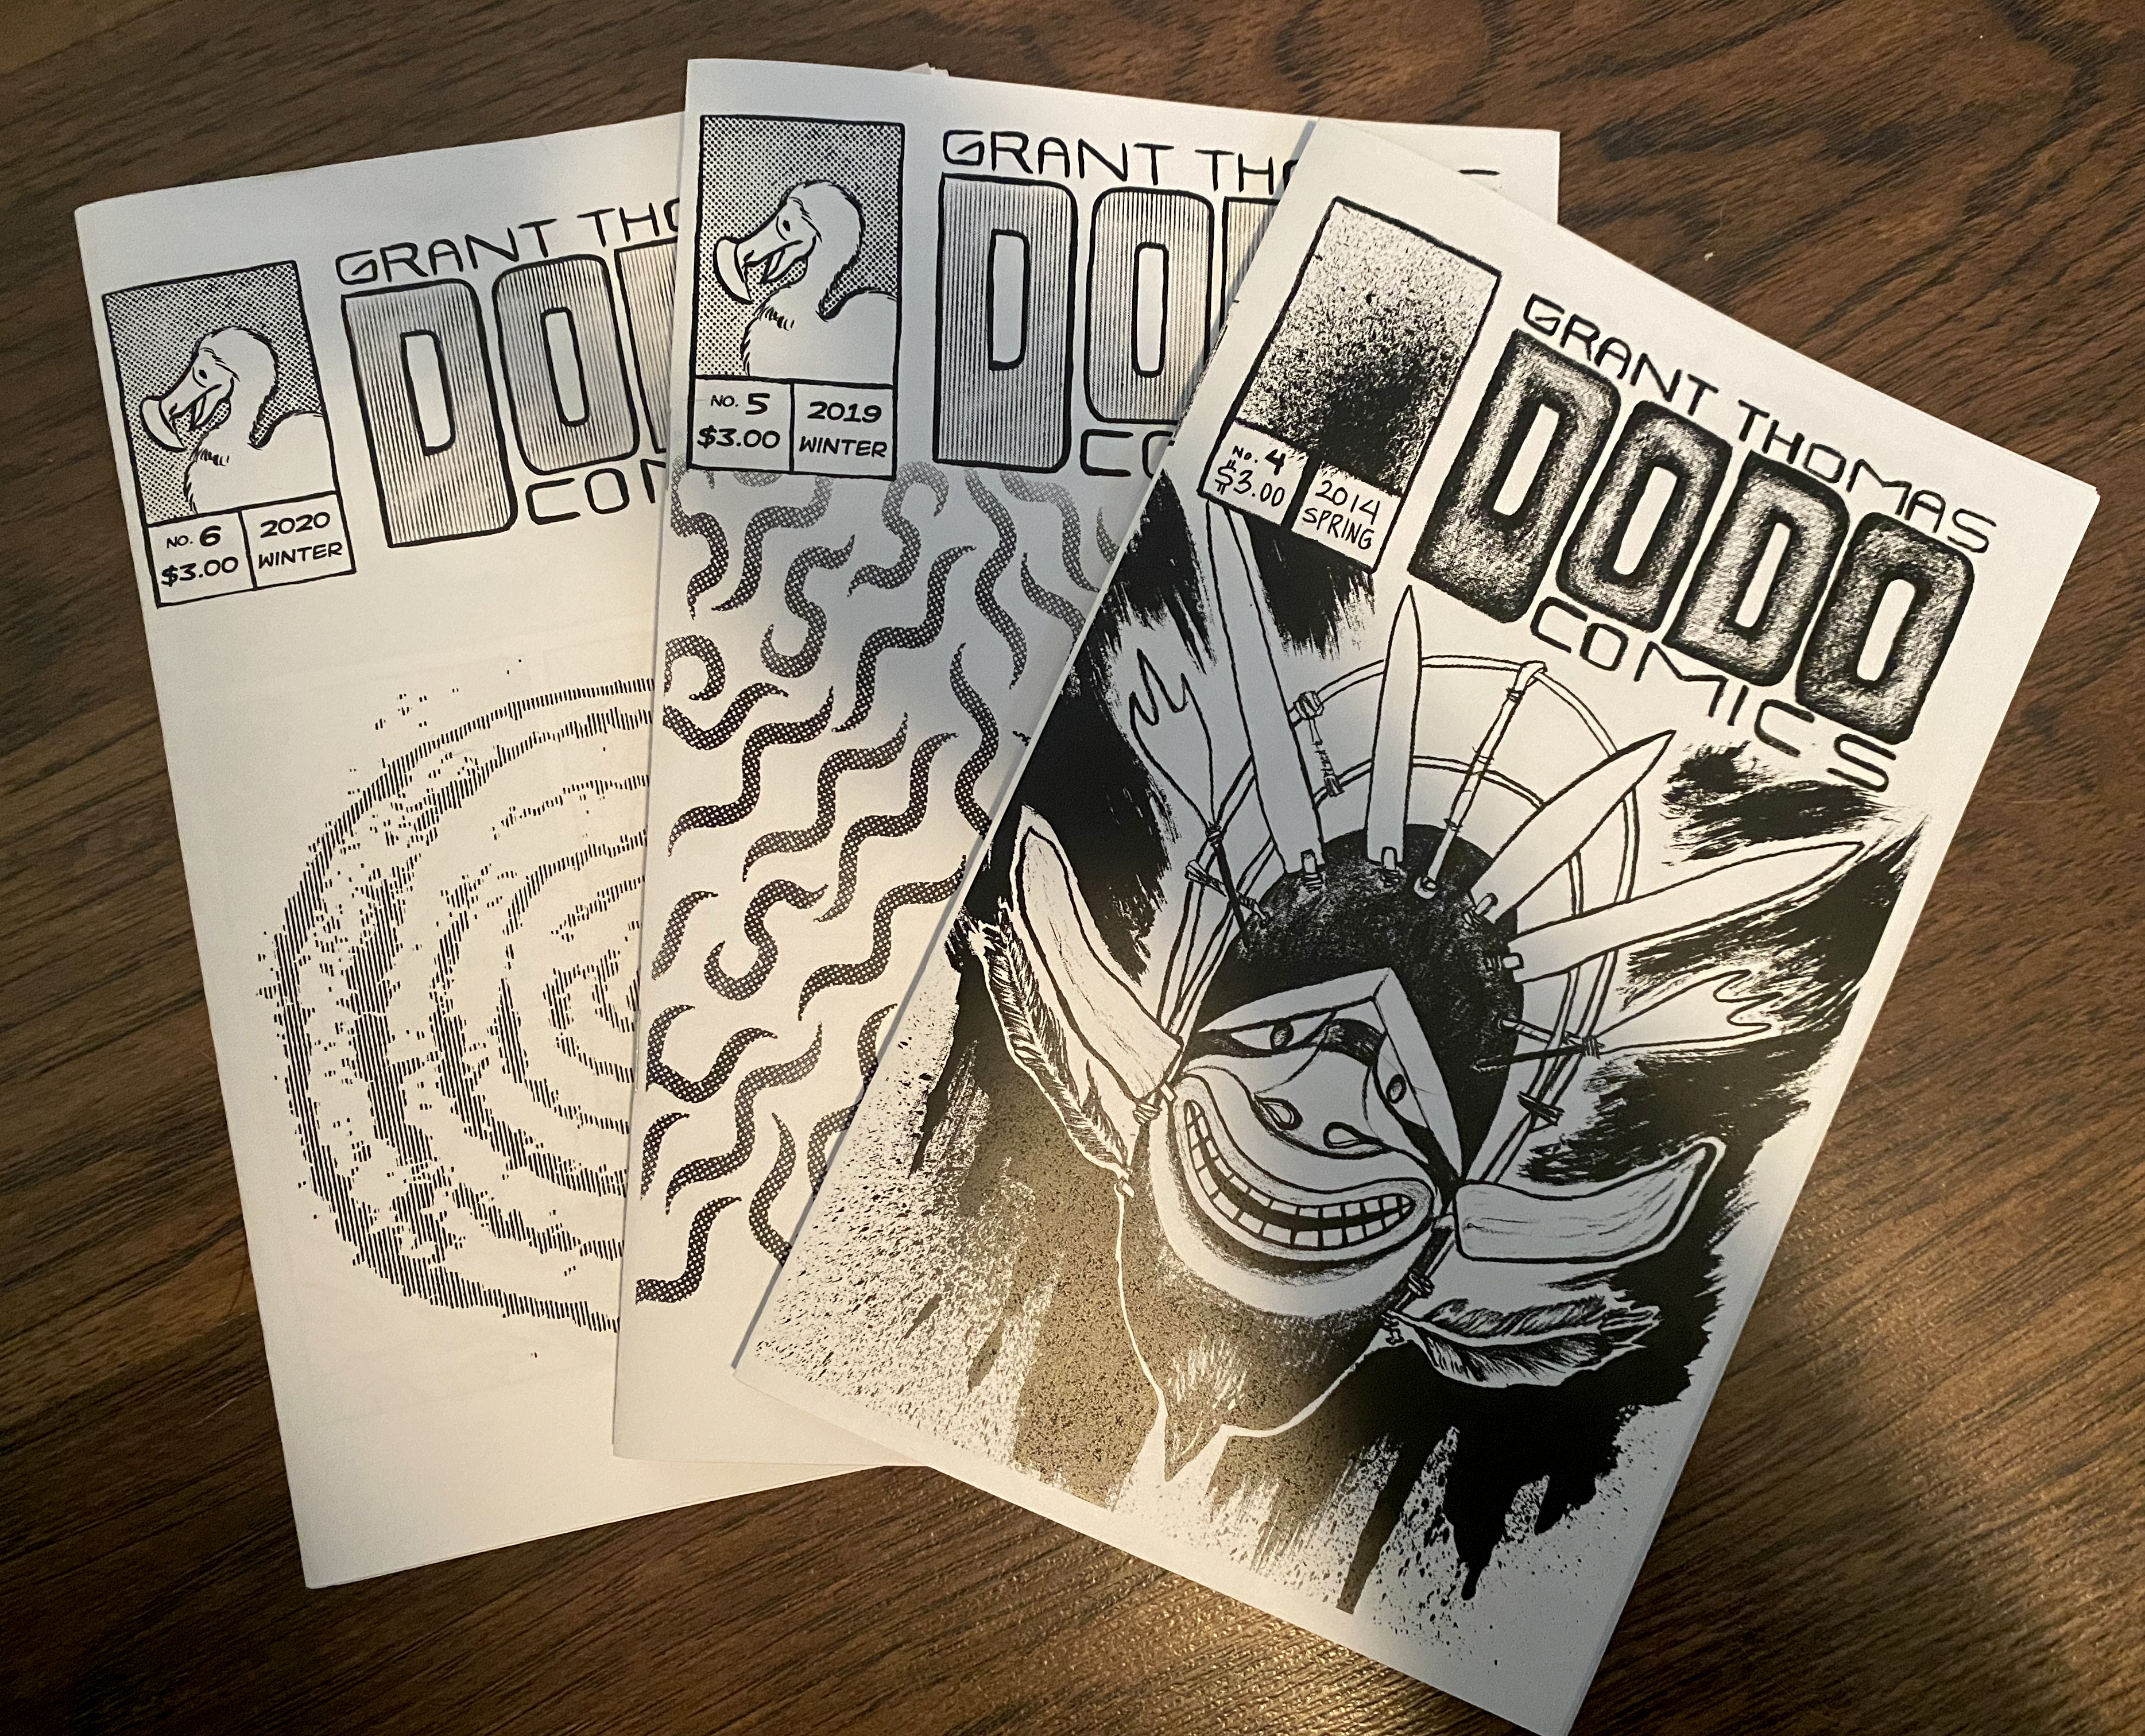 Dodo covers